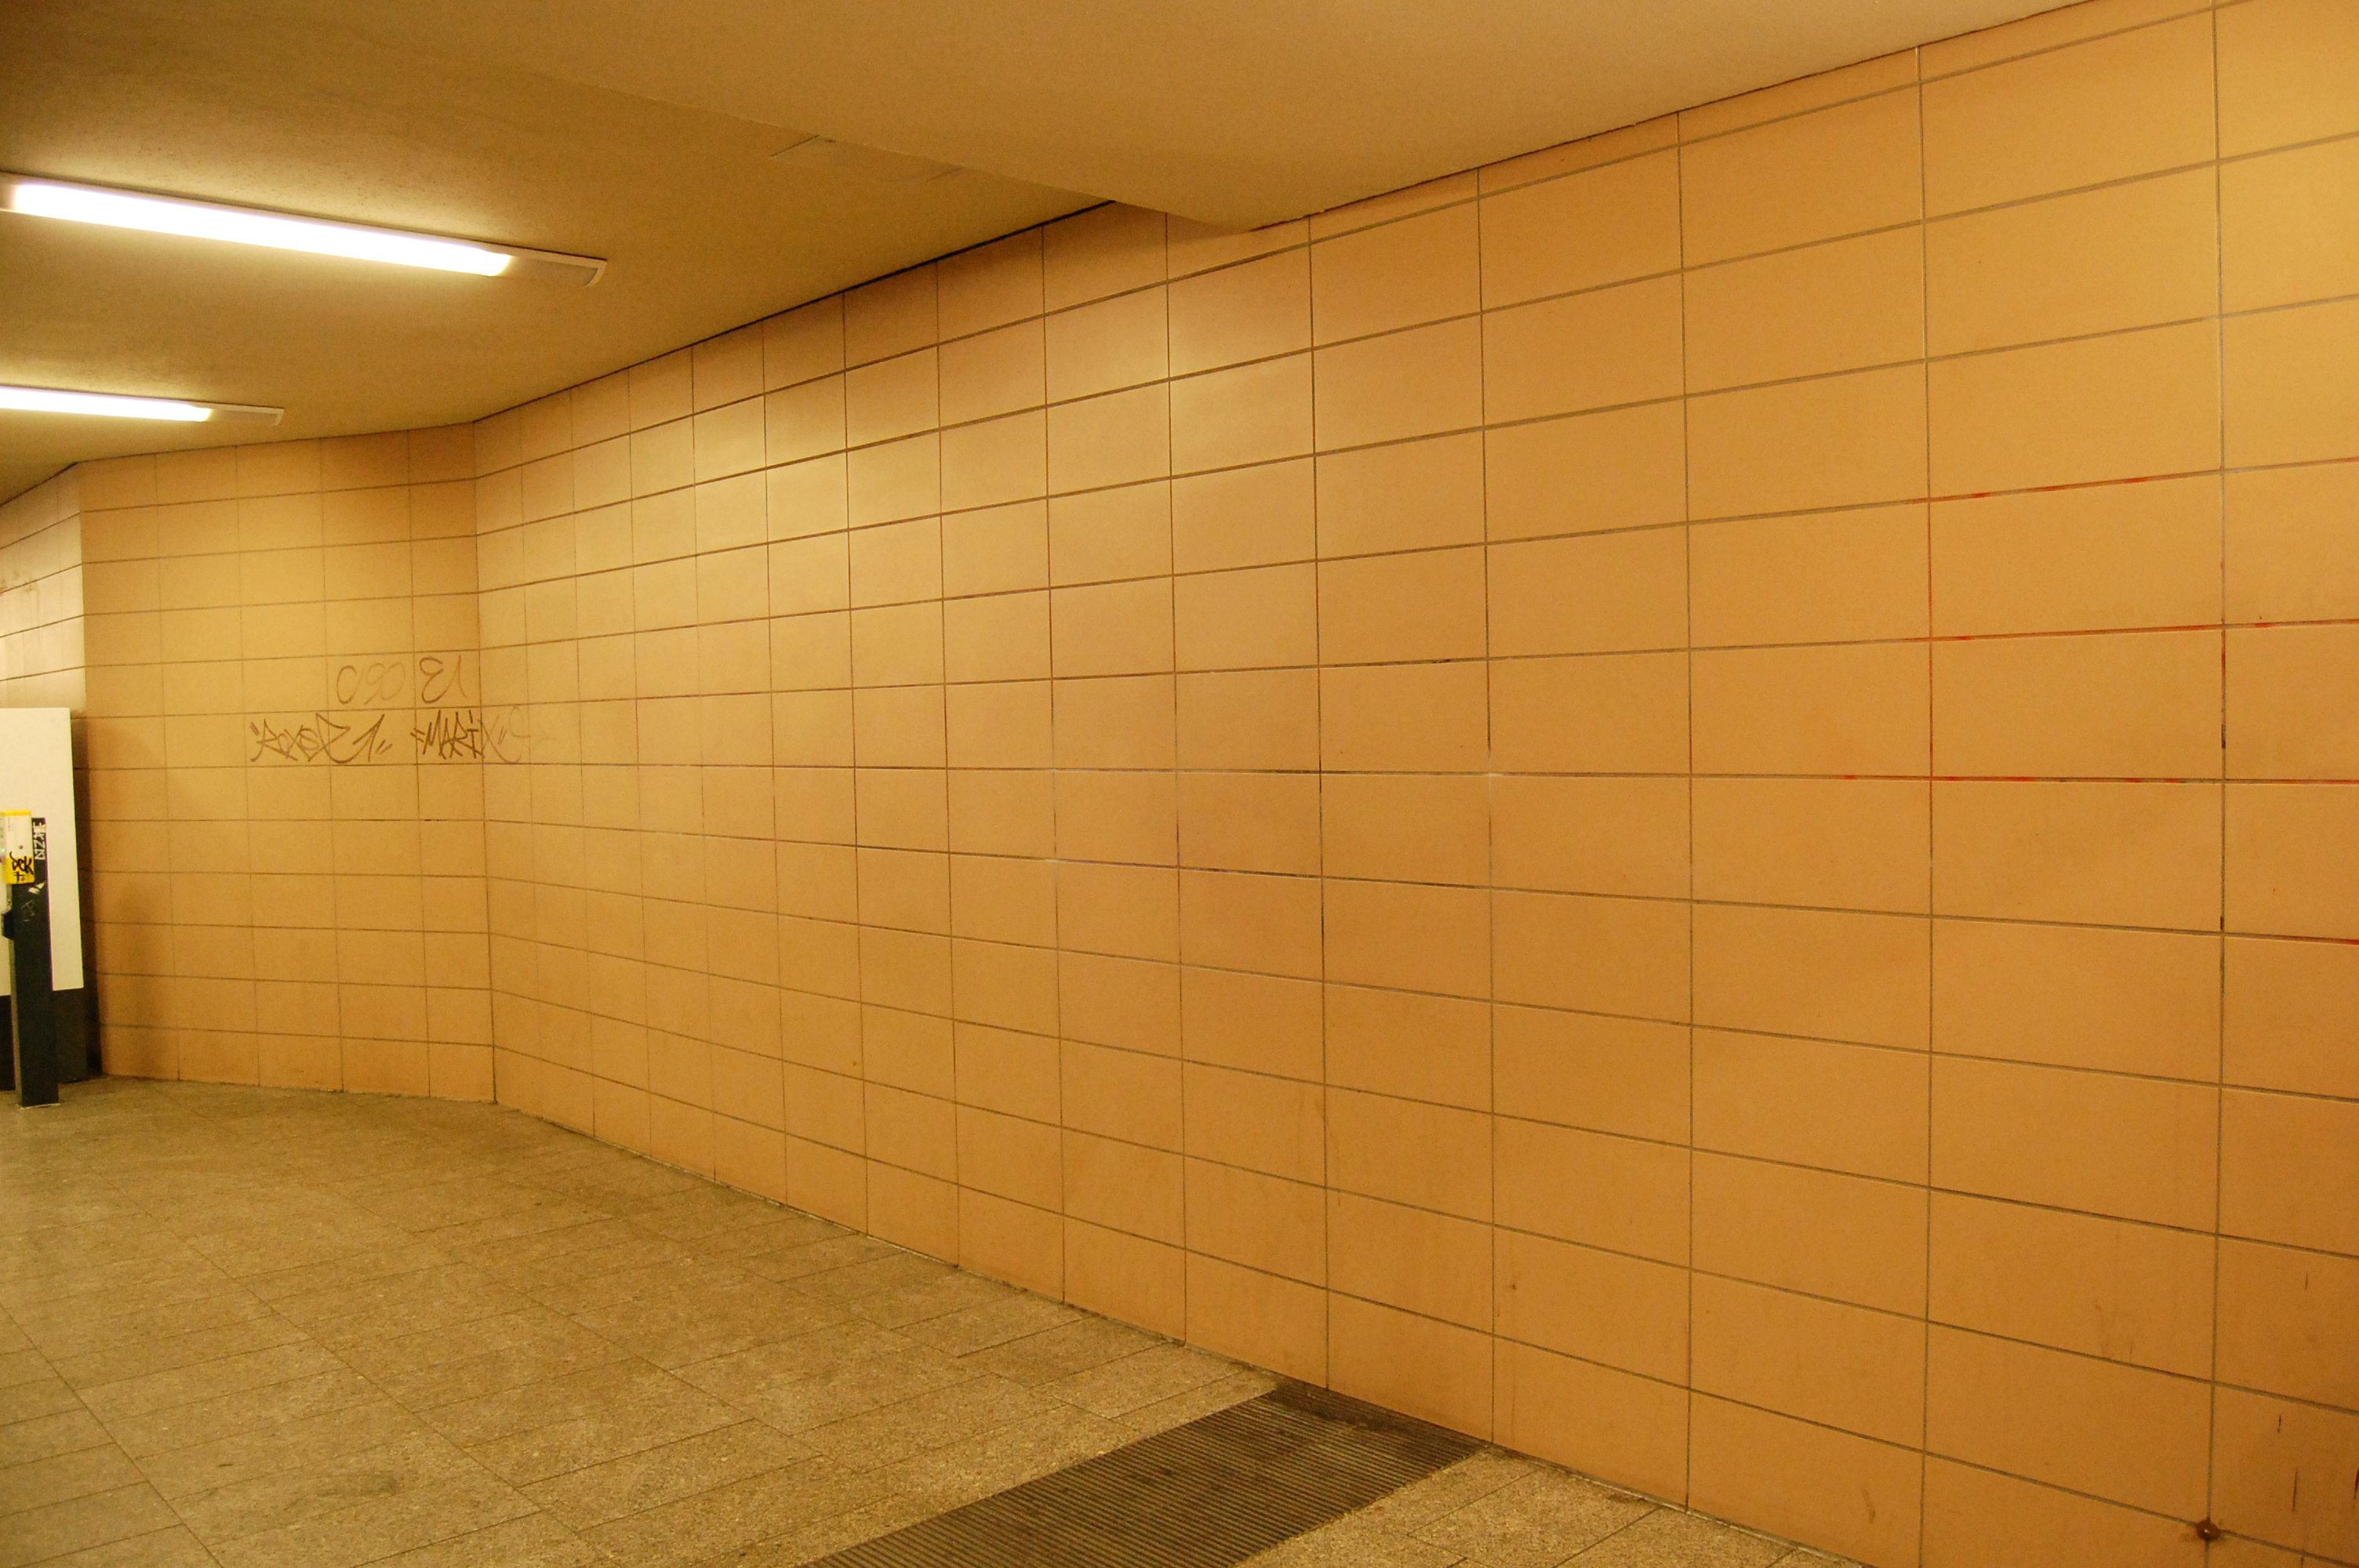 u-bf-bundesplatz-2_web